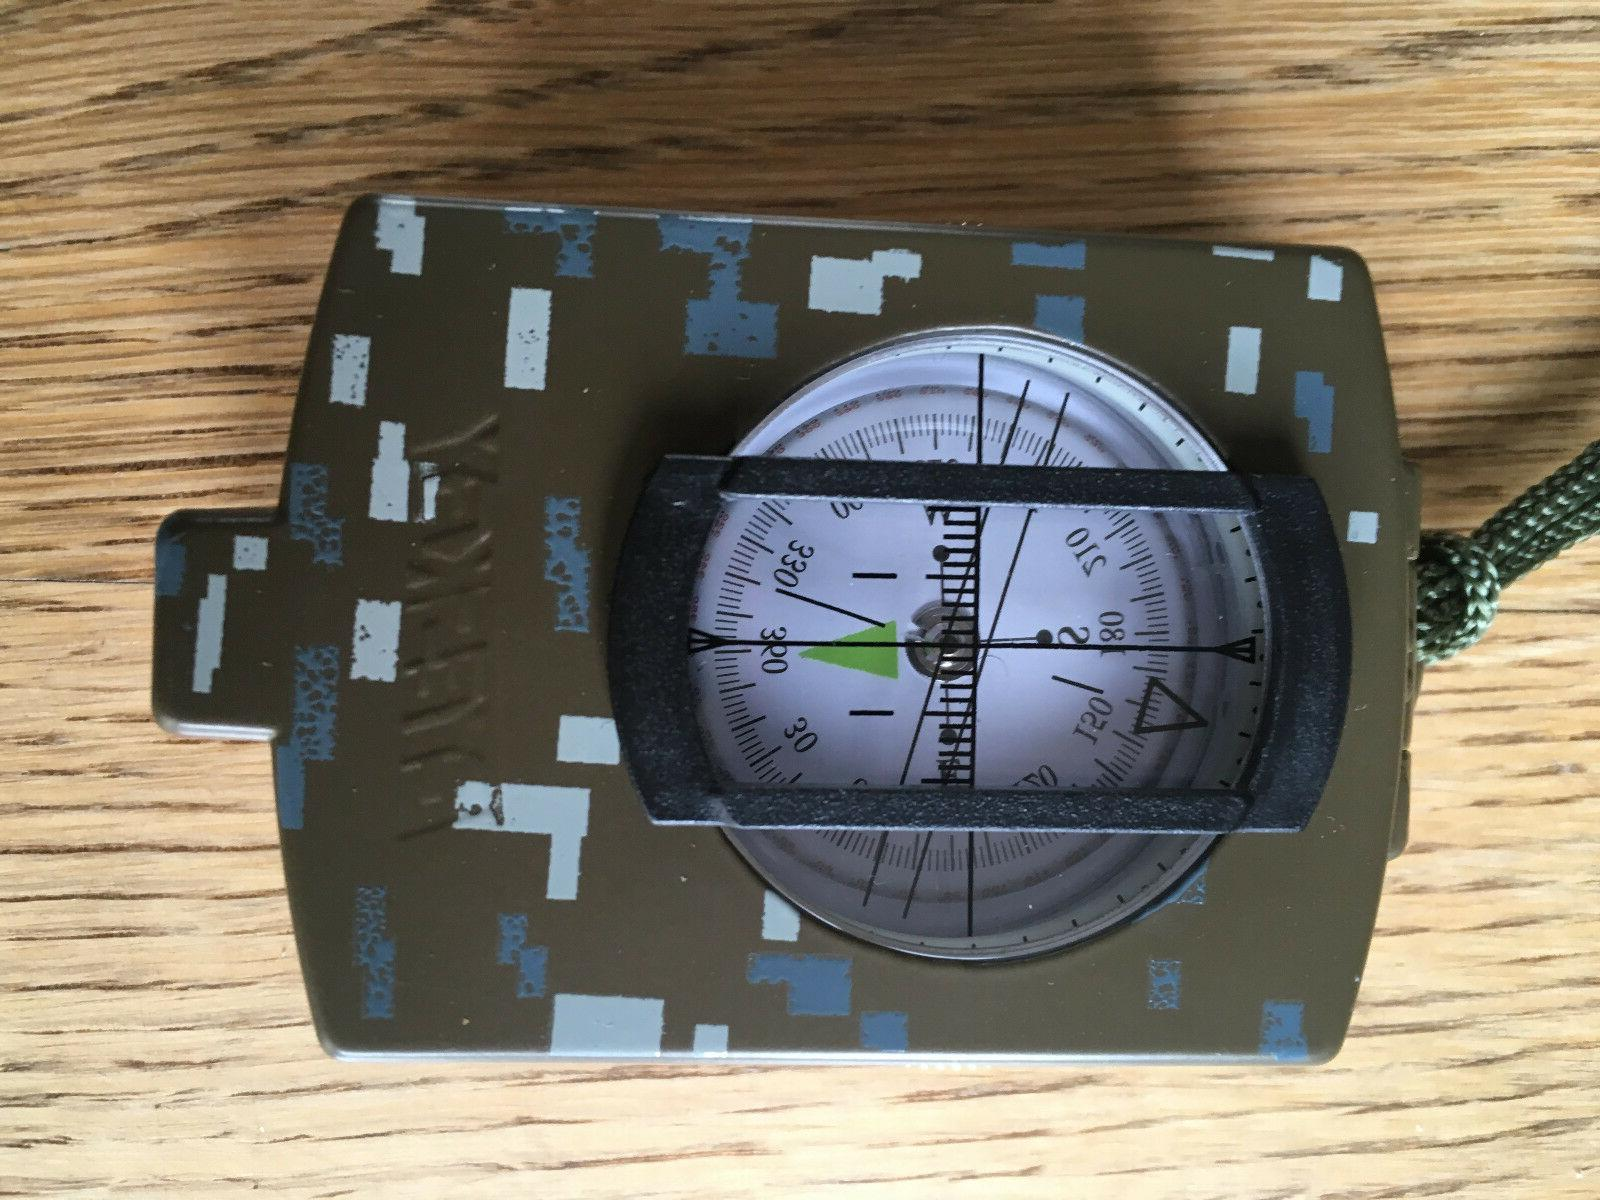 Eyeskey Multifunctional Army Camo NEW